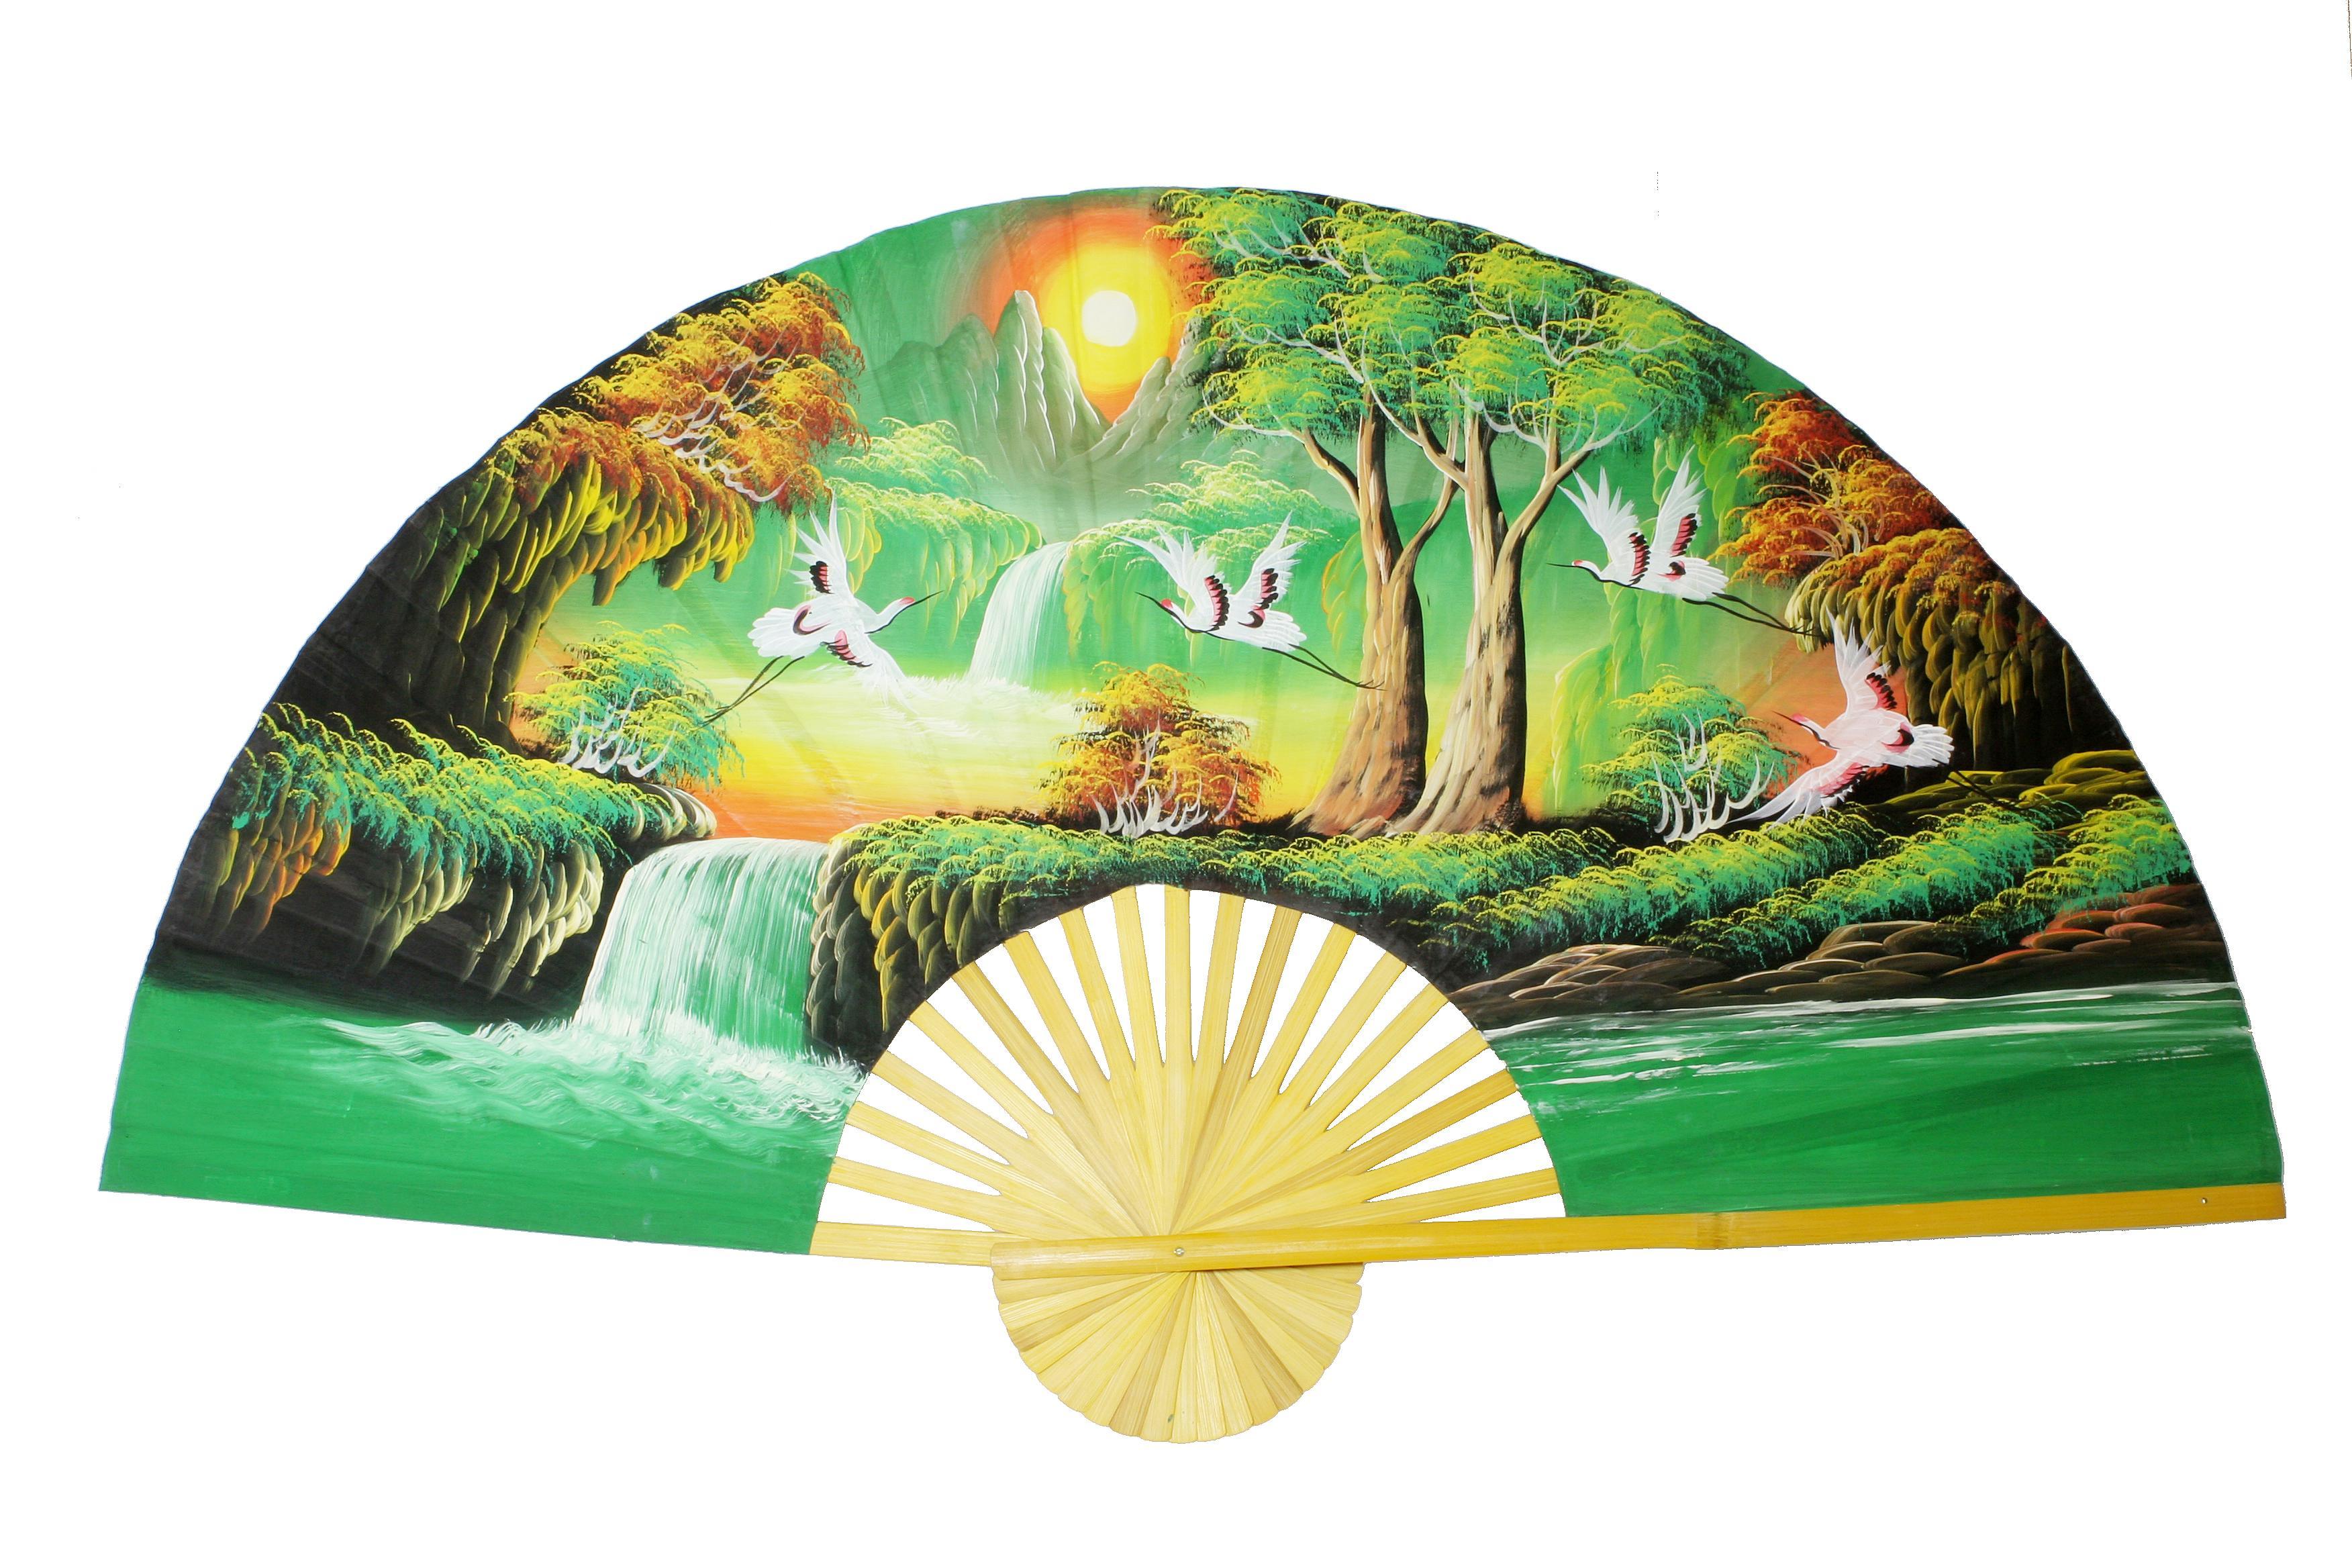 Wandfächer (Green mood)